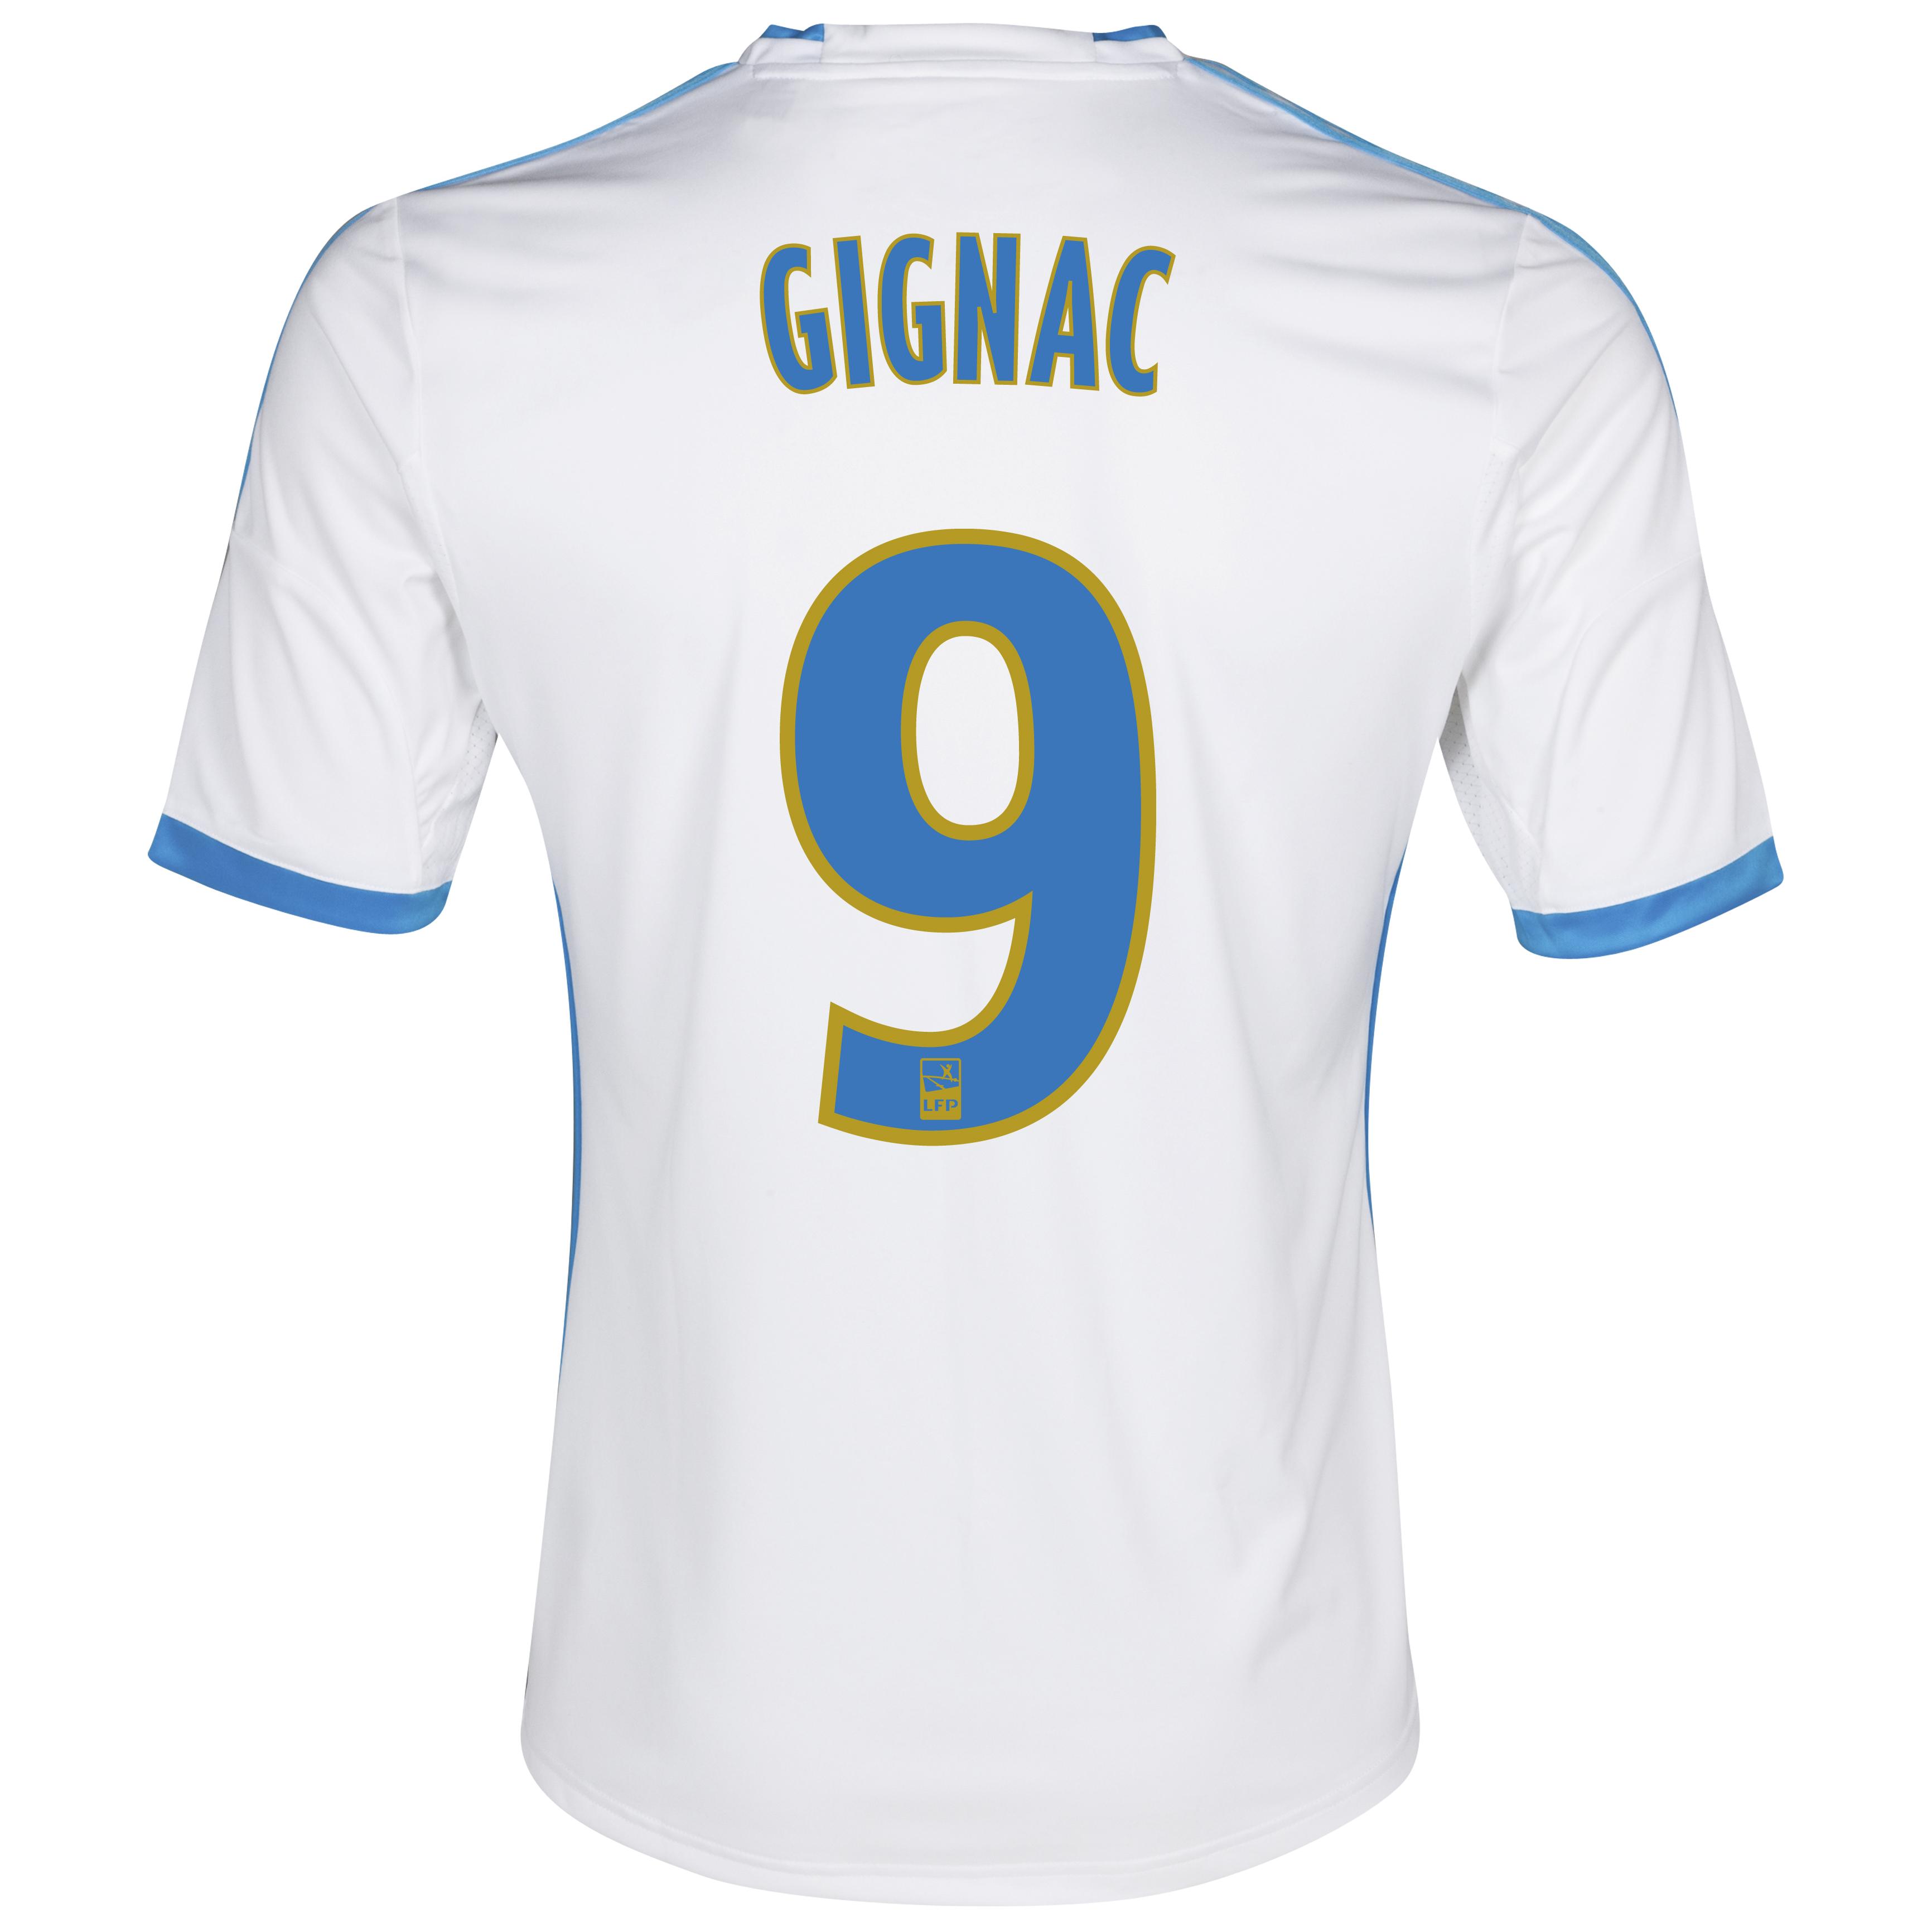 Olympique De Marseille Home Shirt SS 2013/14 - Womens White with Gignac 9 printing